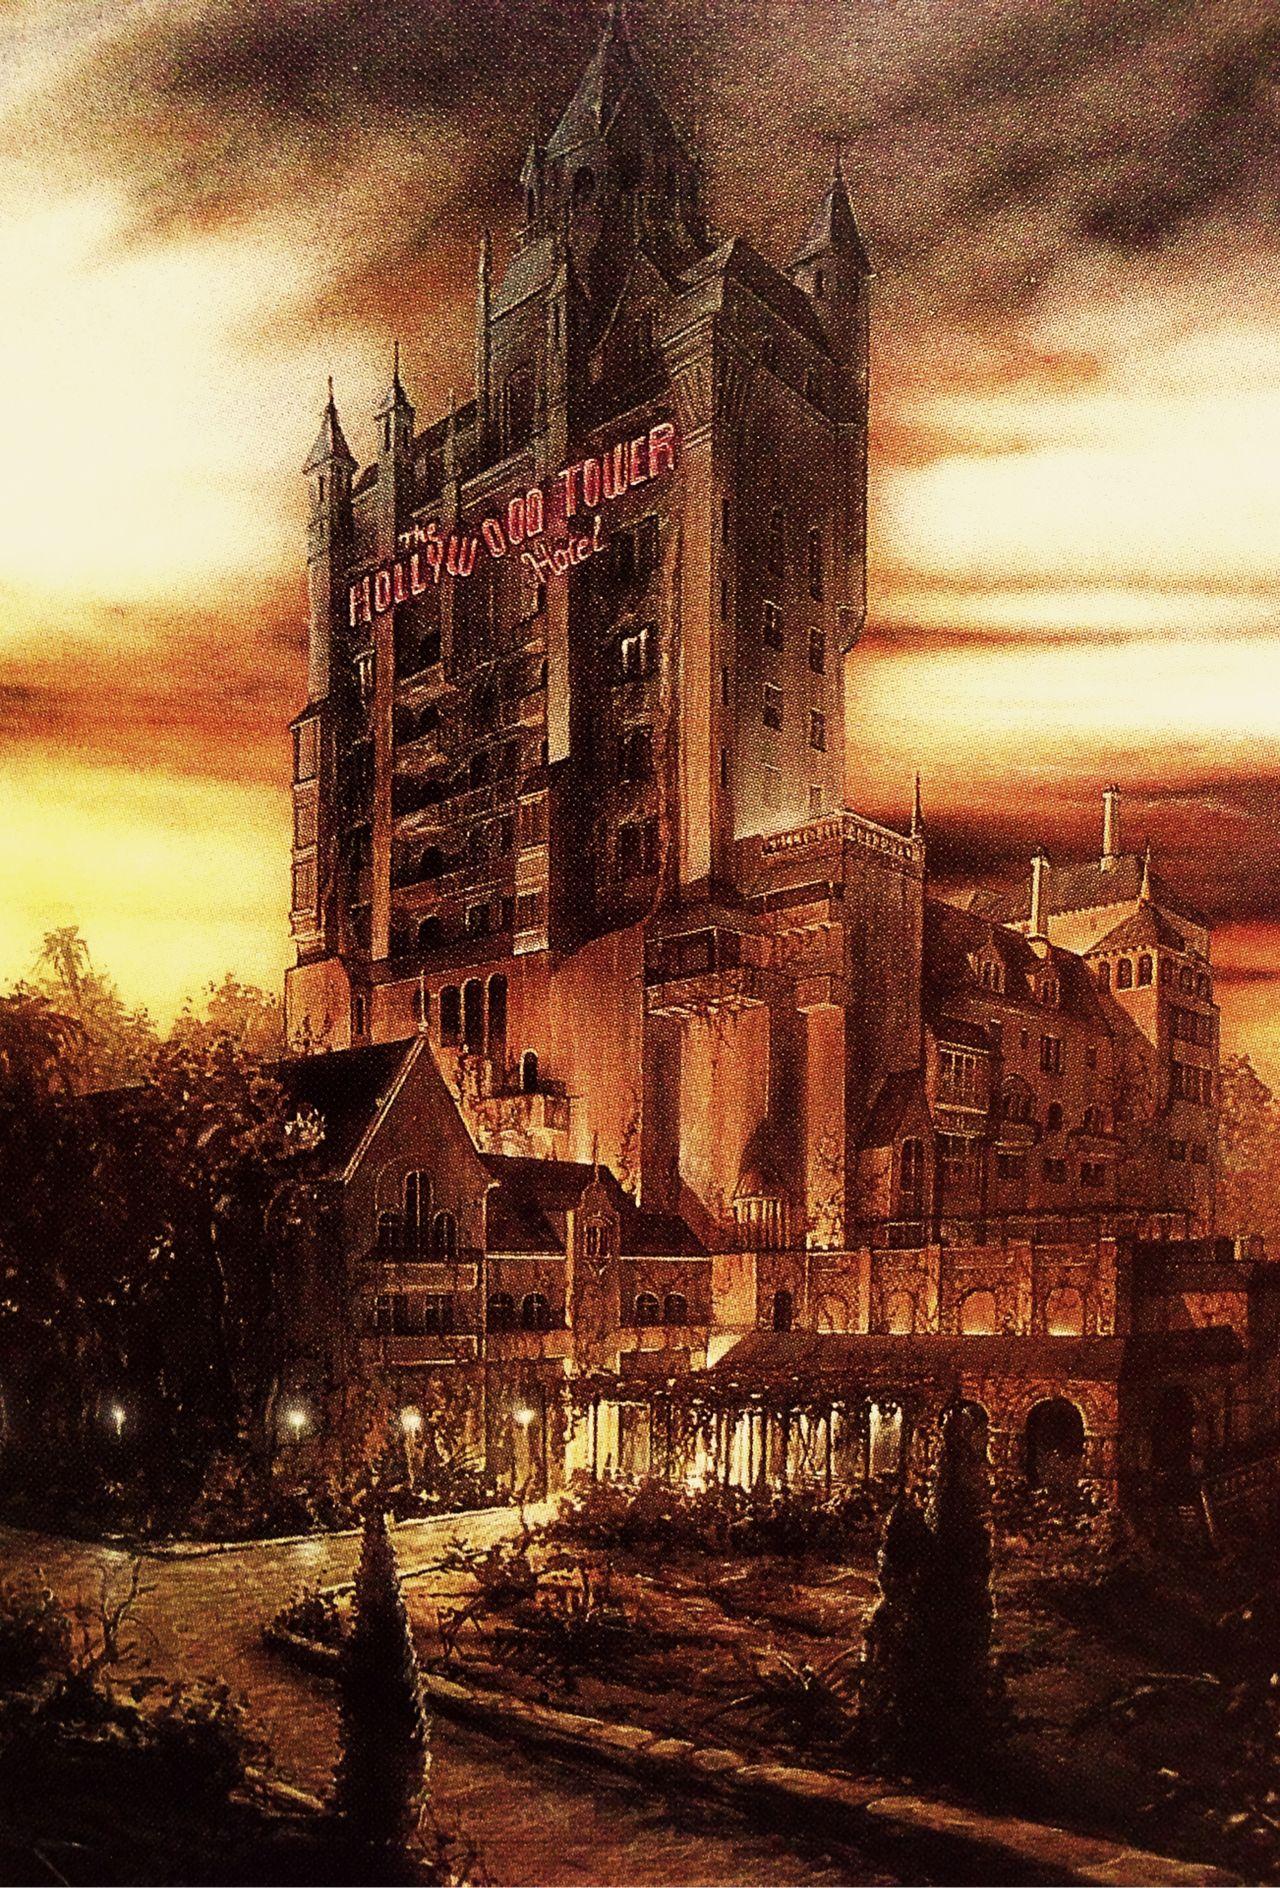 Concept Artwork For The Twilight Zone Tower Of Terror At Disney S Hollywood Studios Then Disney Disney Attractions Walt Disney Imagineering Disney Concept Art